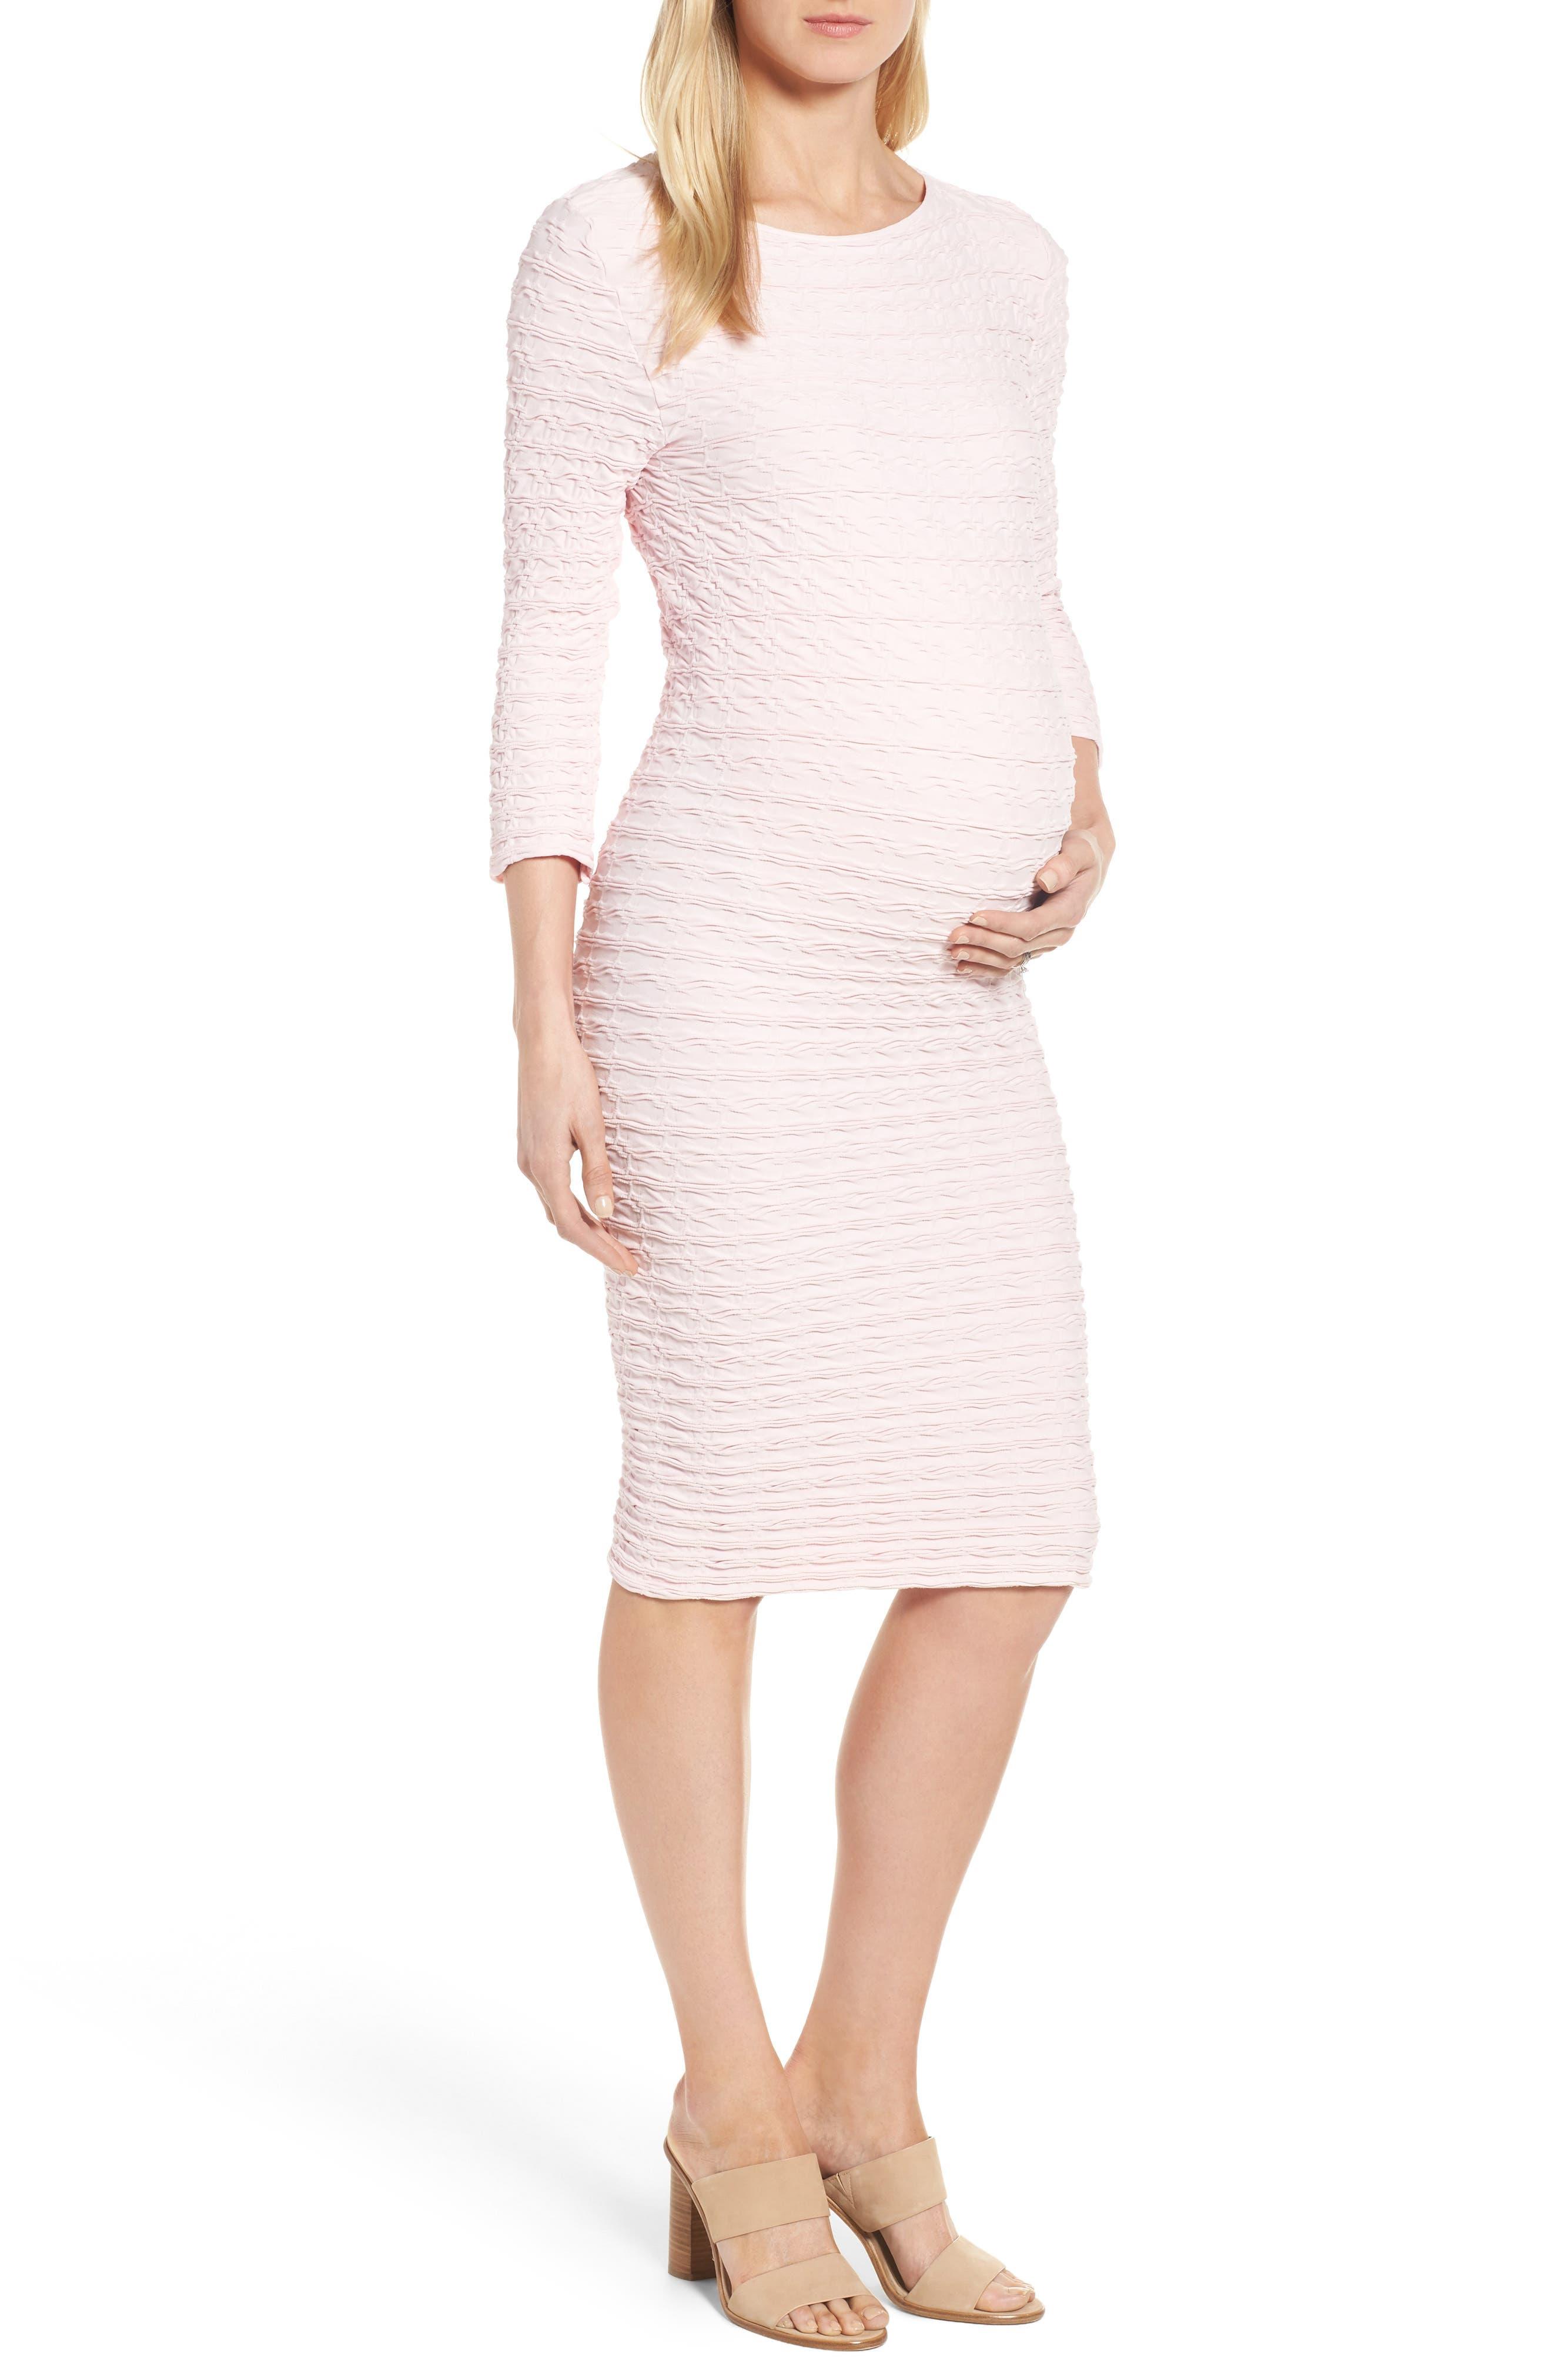 Tees by Tina 'Crinkle' Maternity Midi Dress